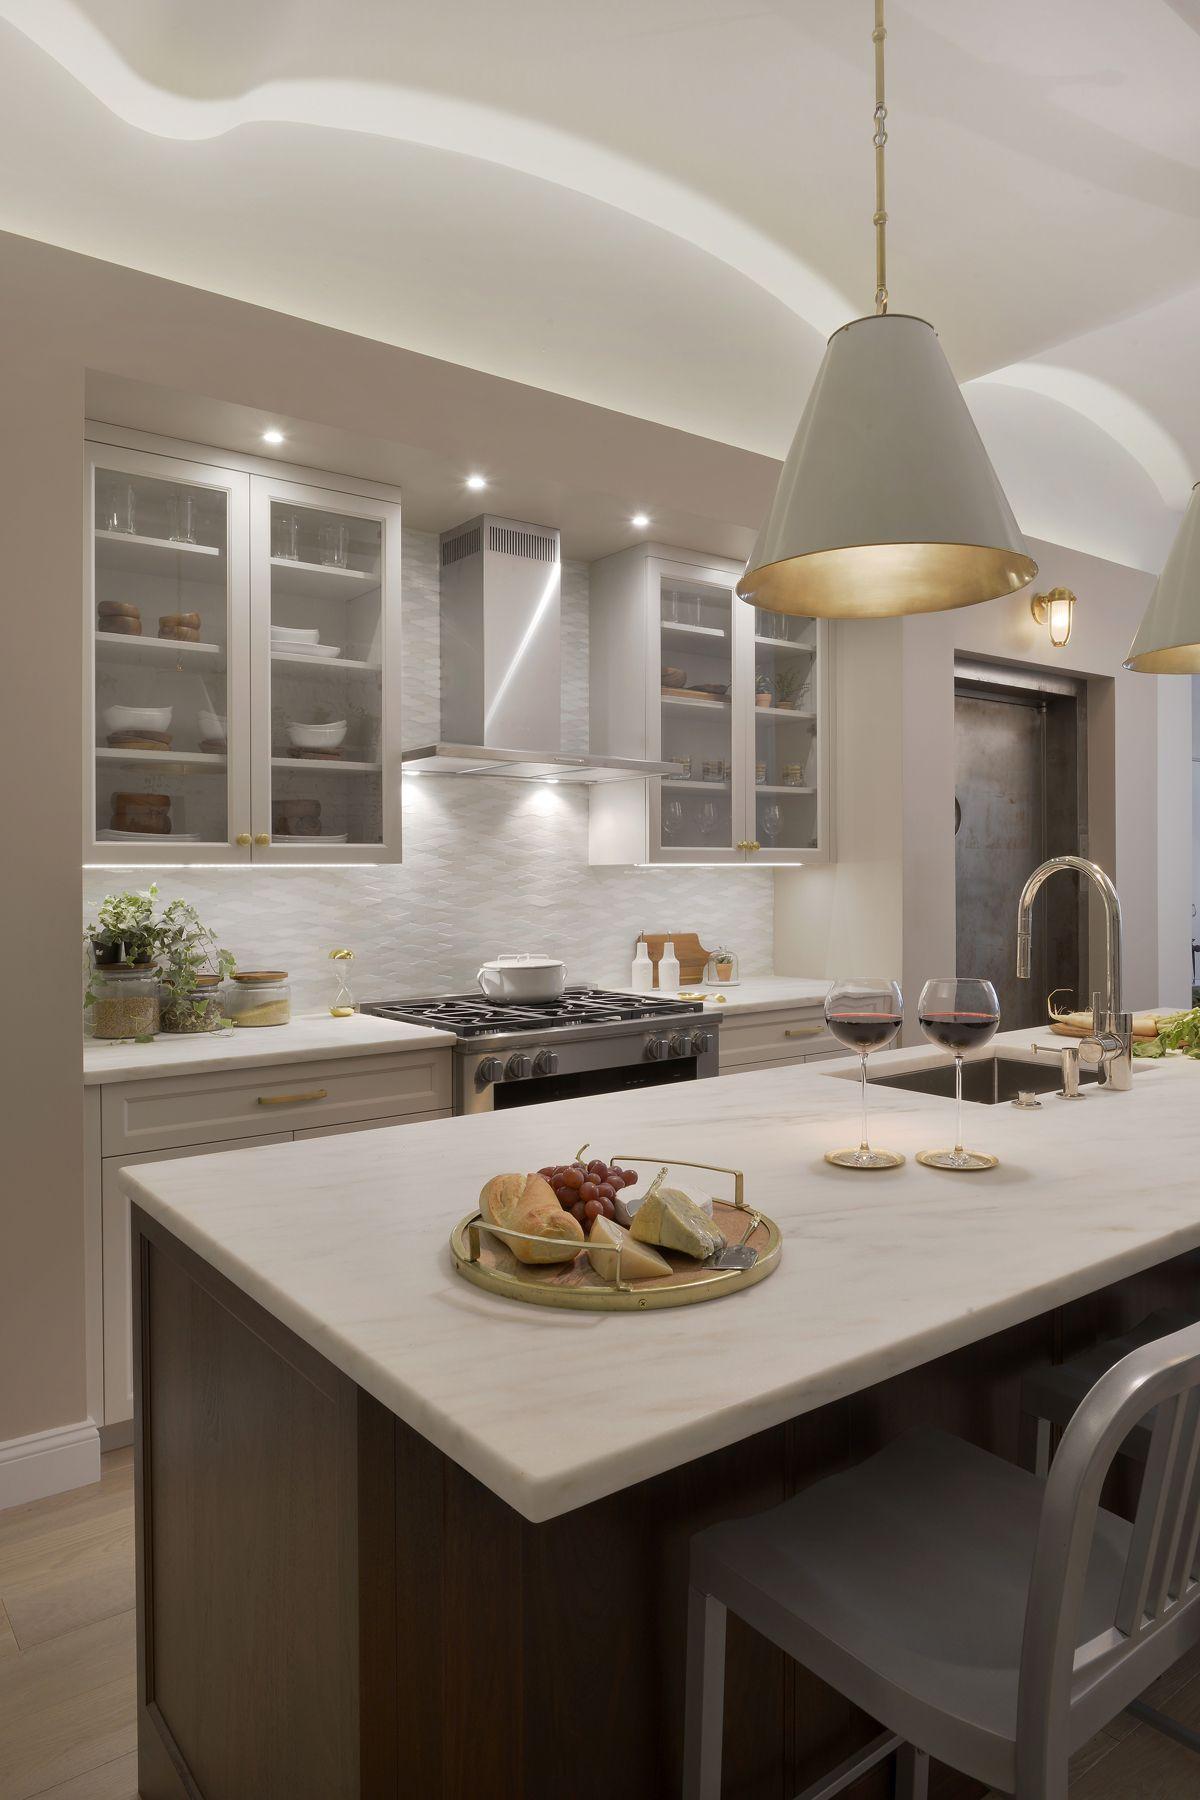 Bilotta transitional kitchen design means you decide enjoy a